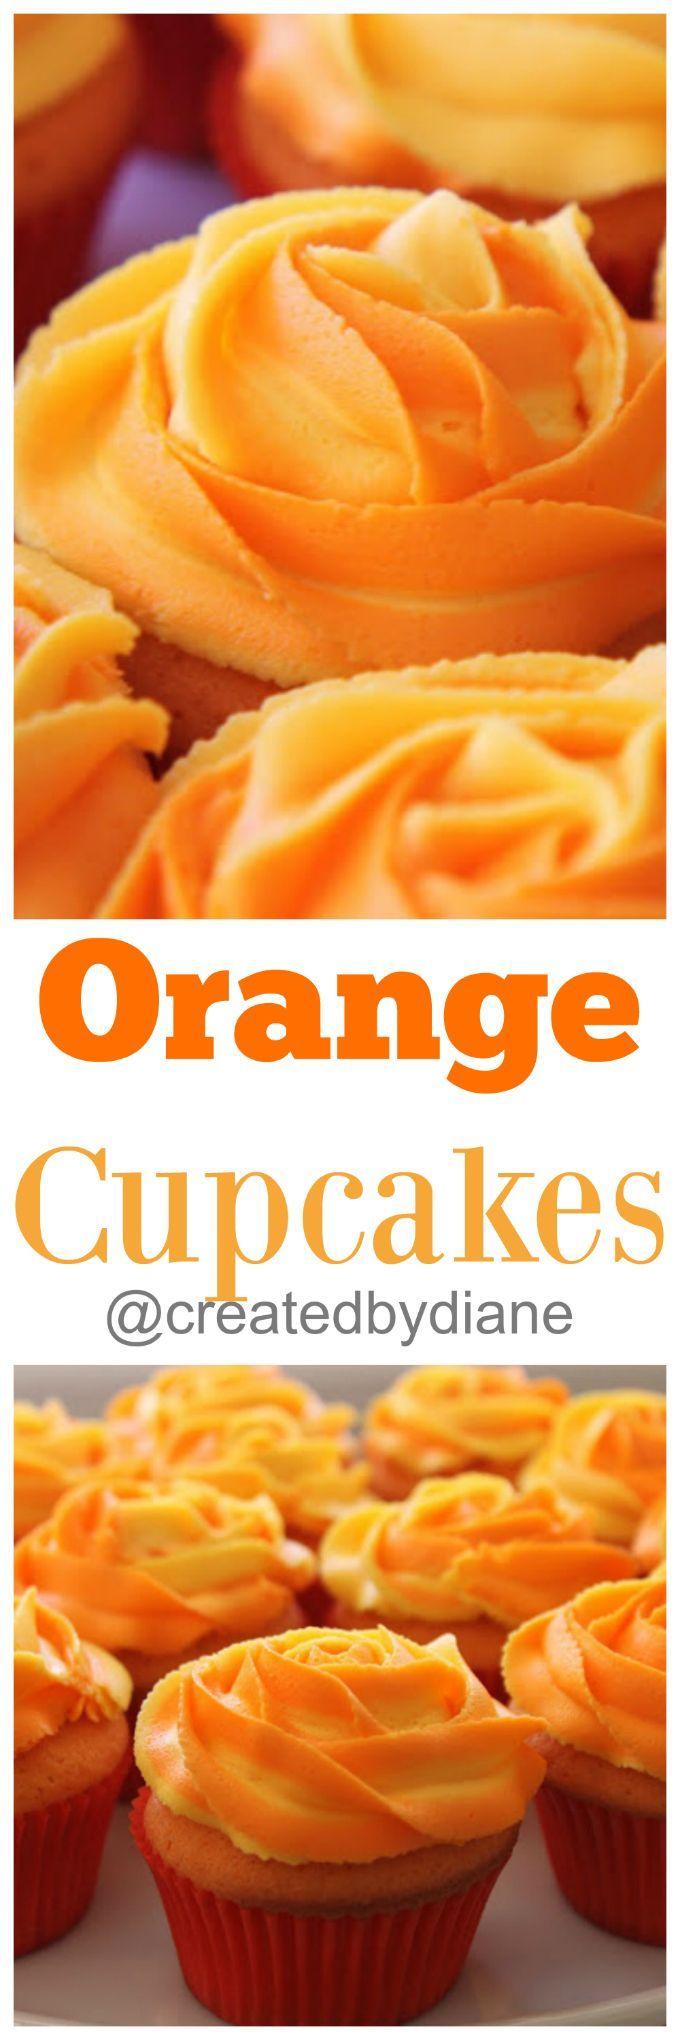 orange cupcakes @createdbydiane